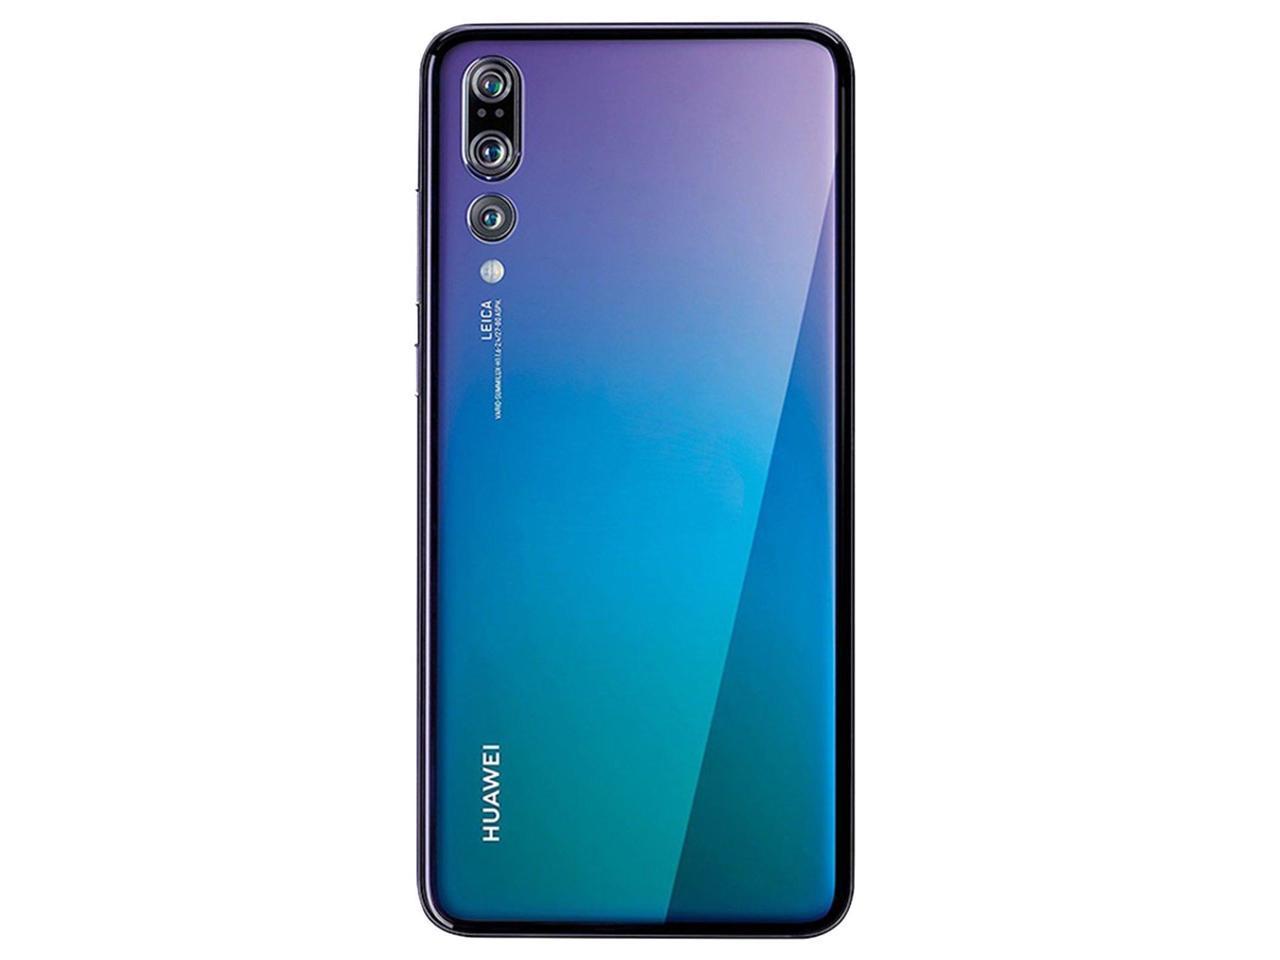 Huawei P20 Pro Single-SIM CLT-L29 128GB (No CDMA, GSM only